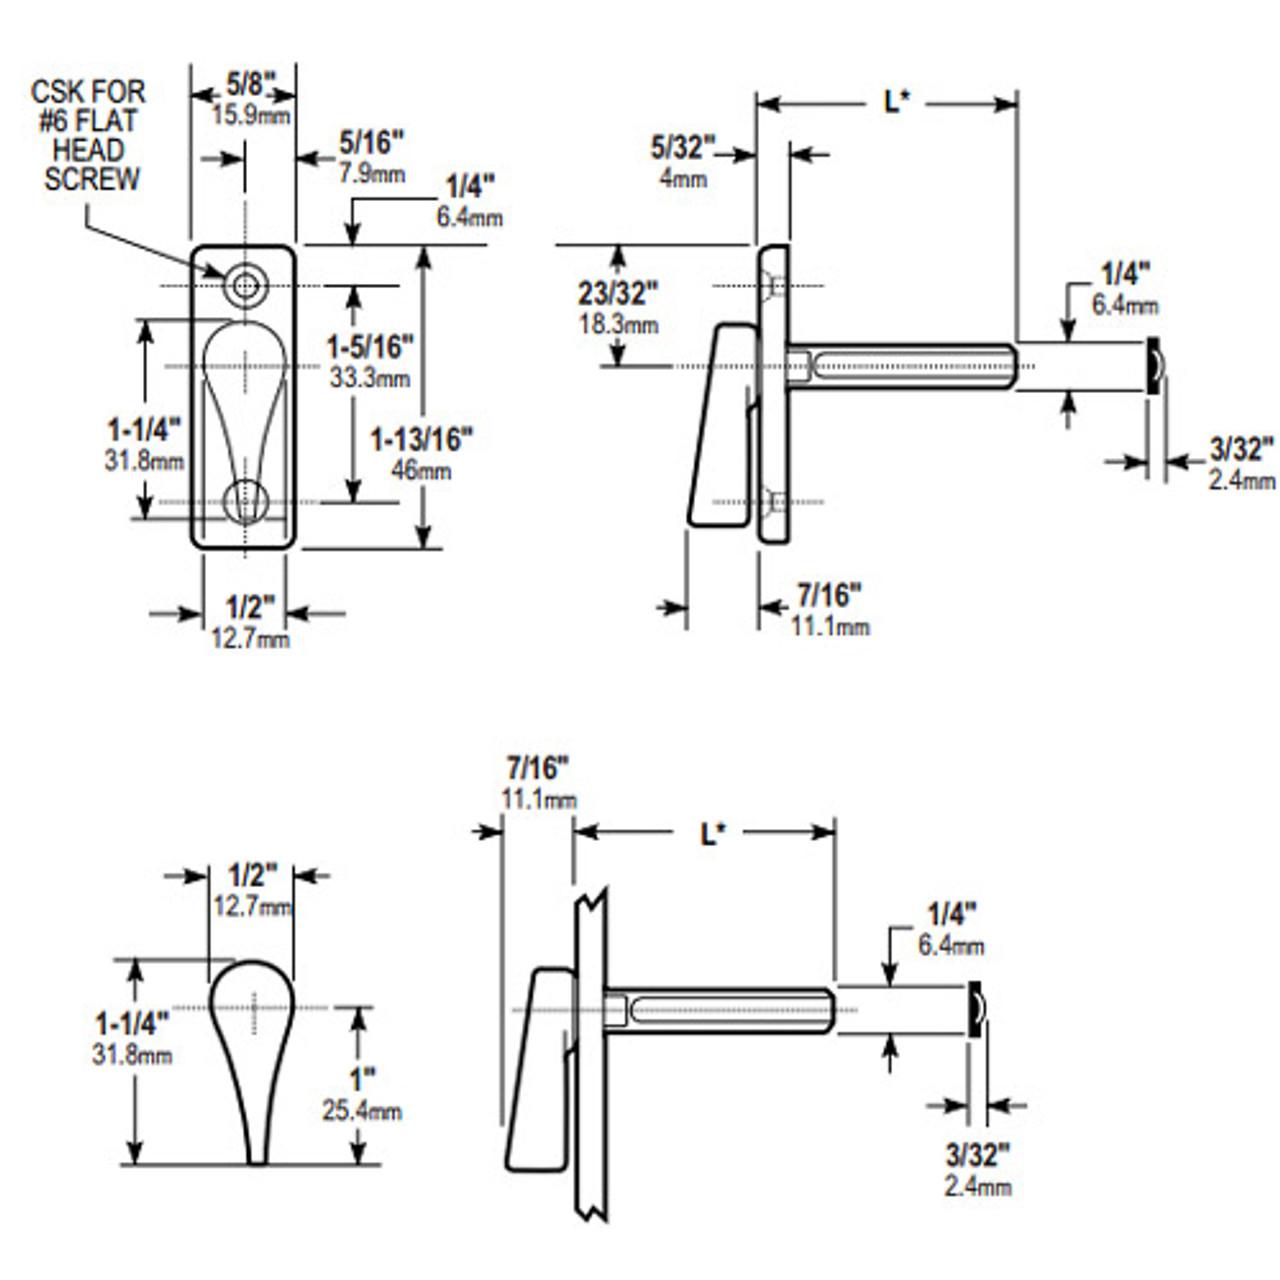 1000-21-29-121 Adams Rite 1000 Series Turns Dimensional View